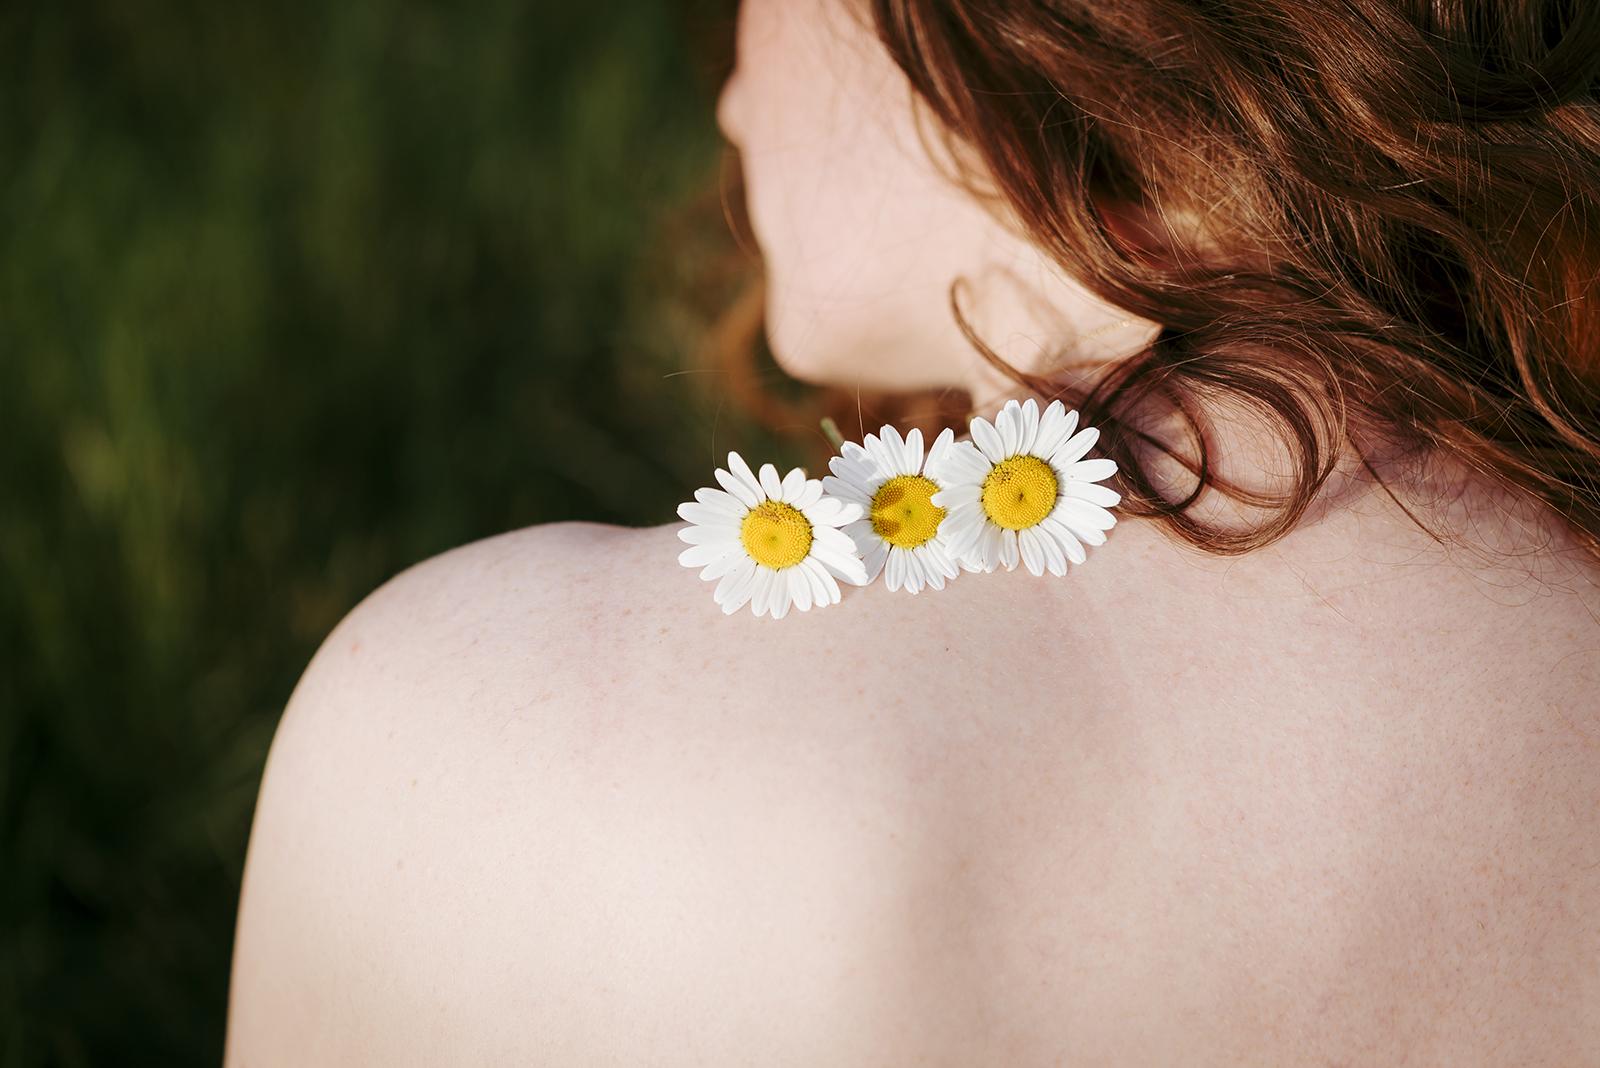 fleur epaule de femme nue